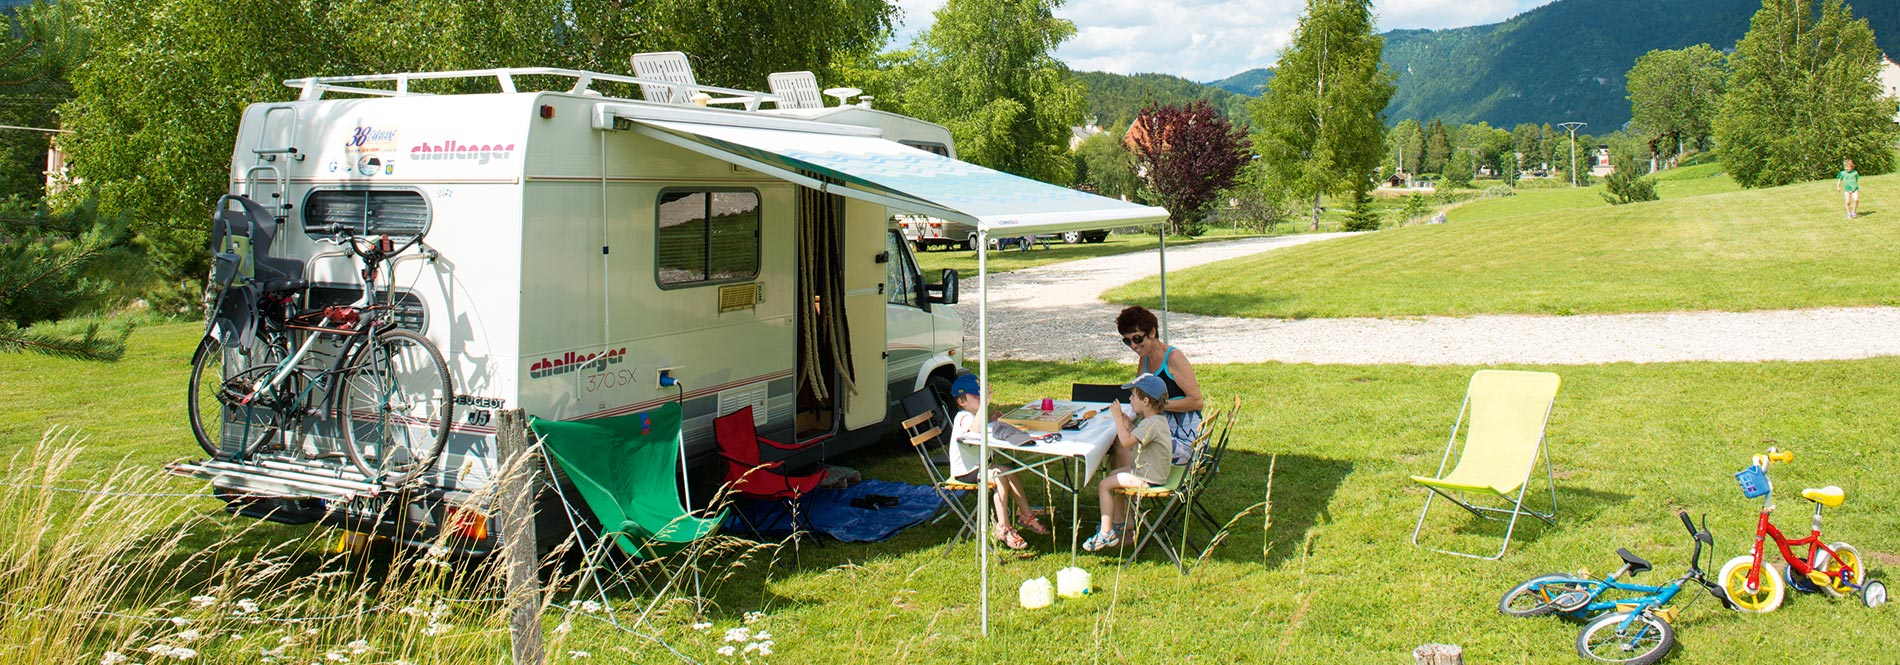 le nostre piazzole camping tende roulotte o camper vivete le vostre vacanze all 39 aria aperta. Black Bedroom Furniture Sets. Home Design Ideas